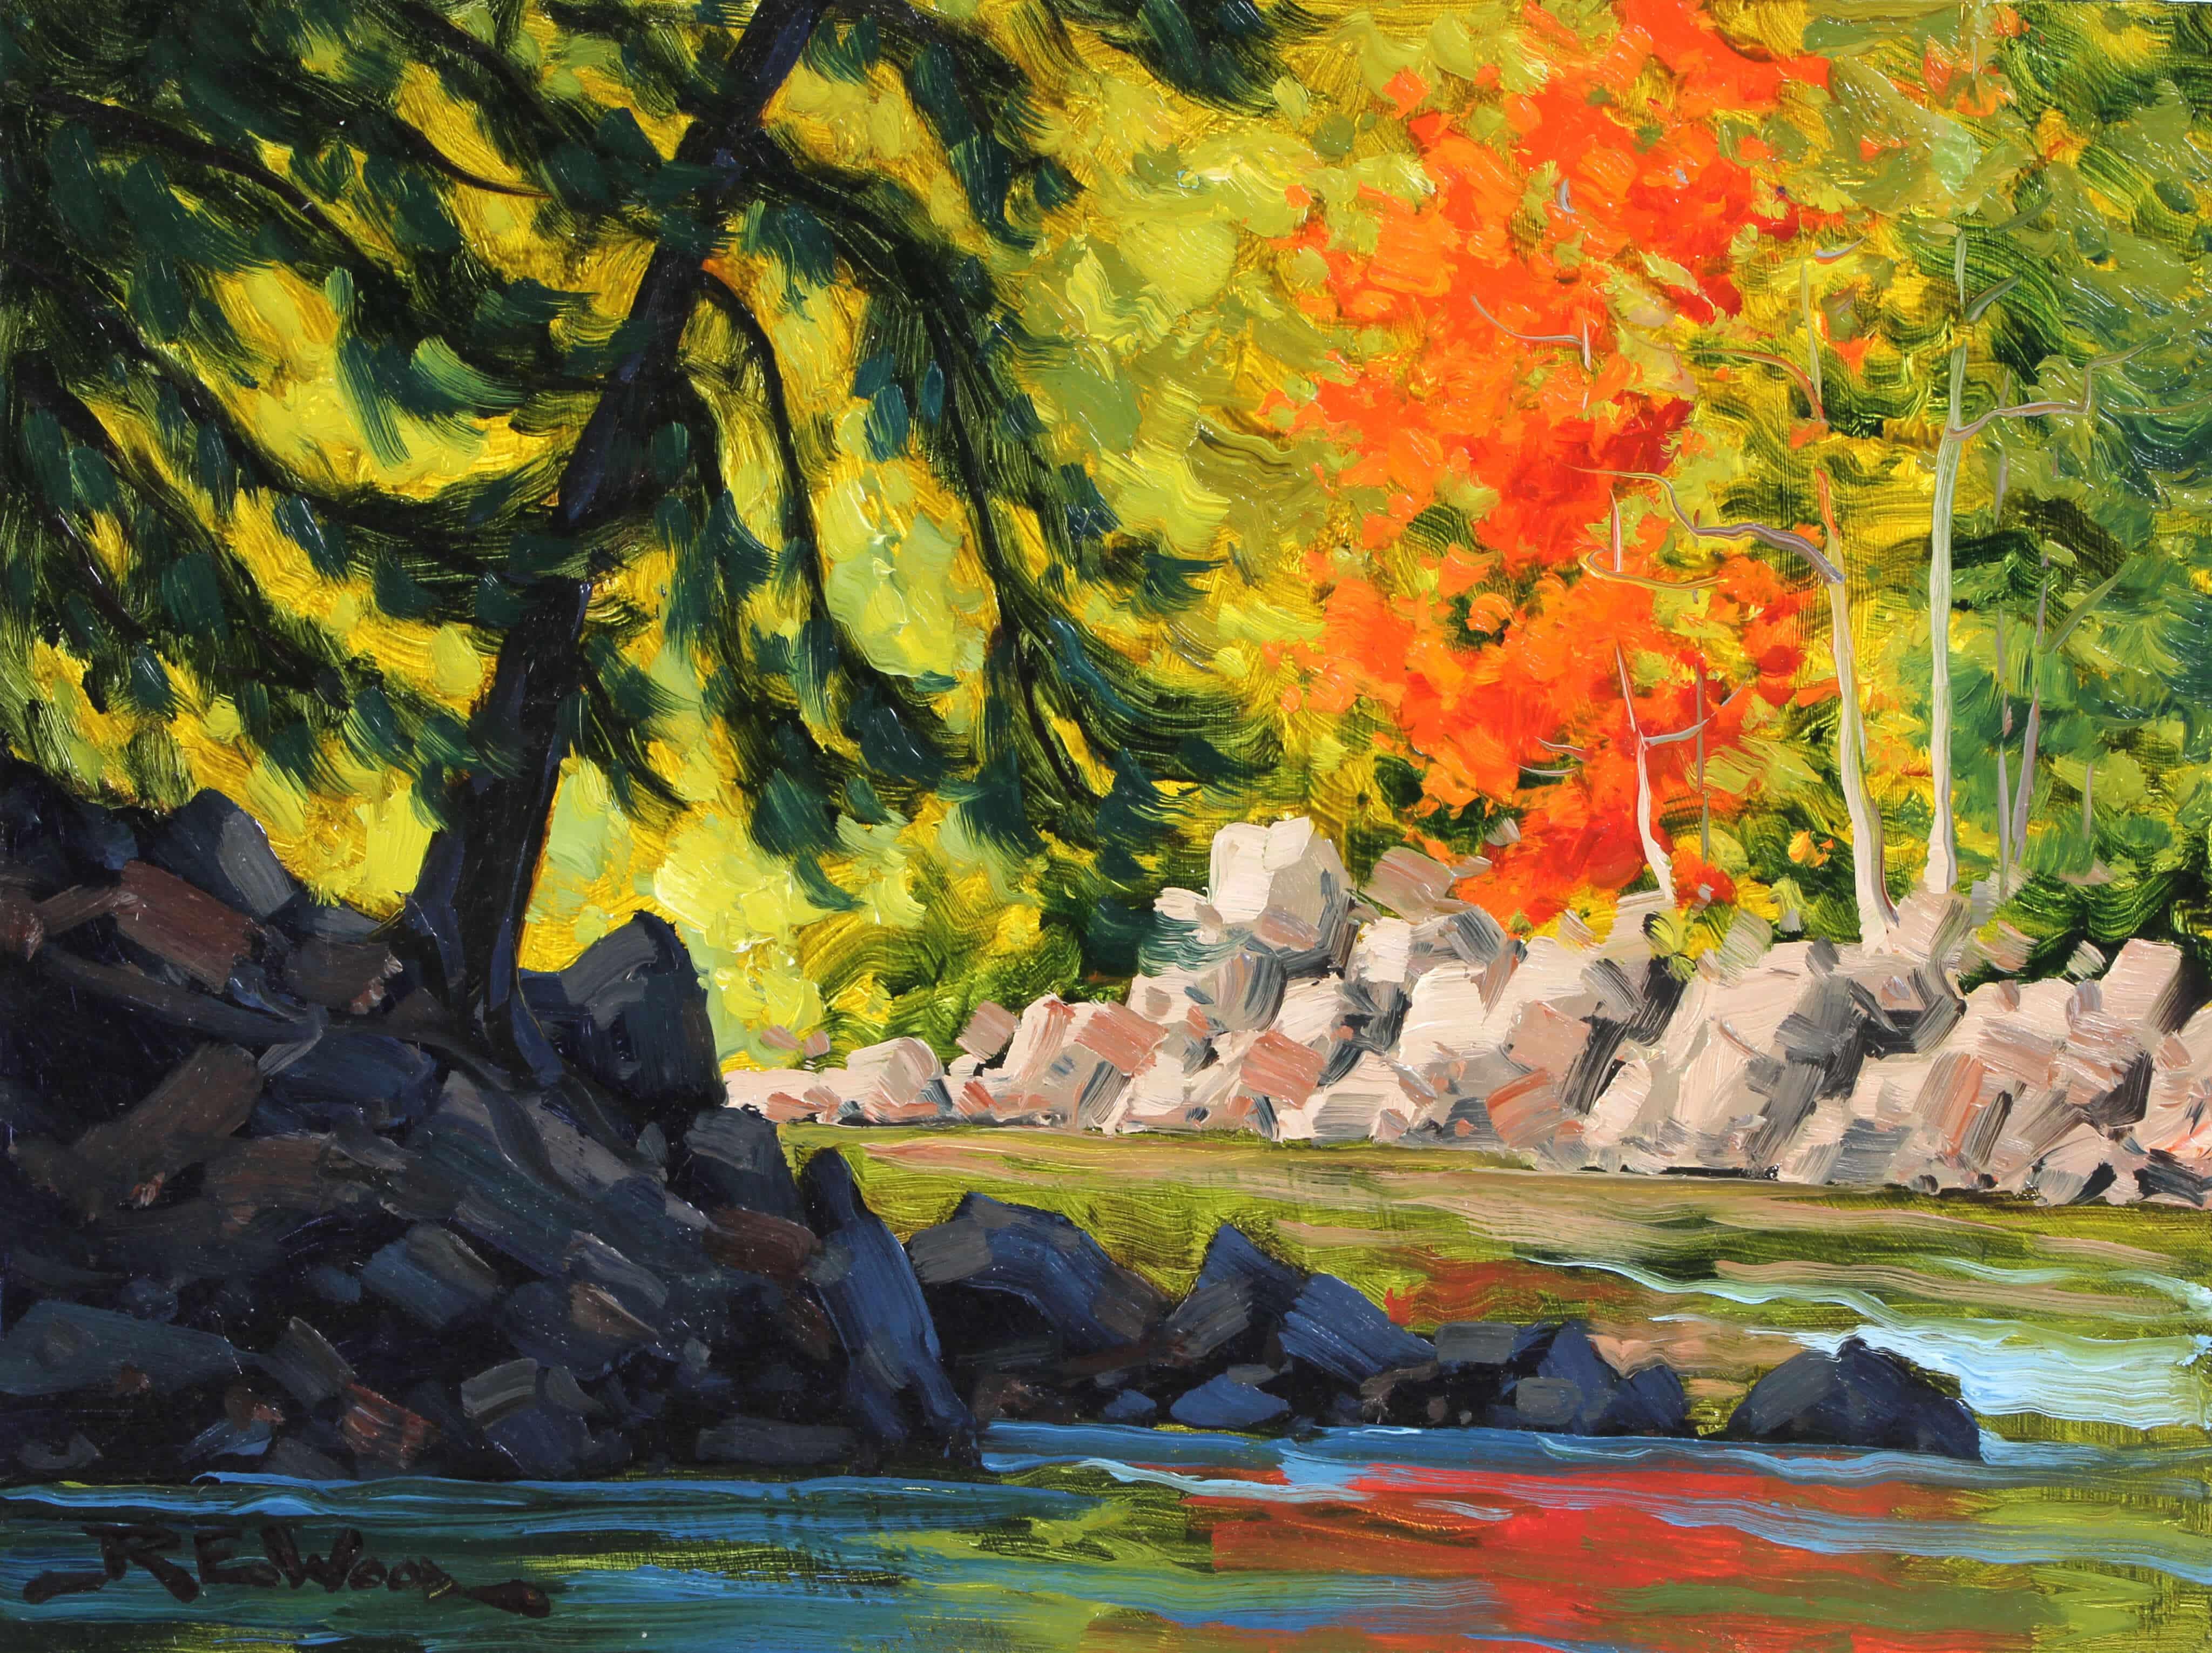 Robert E Wood Shadows and Light Oxtounge River 9x12